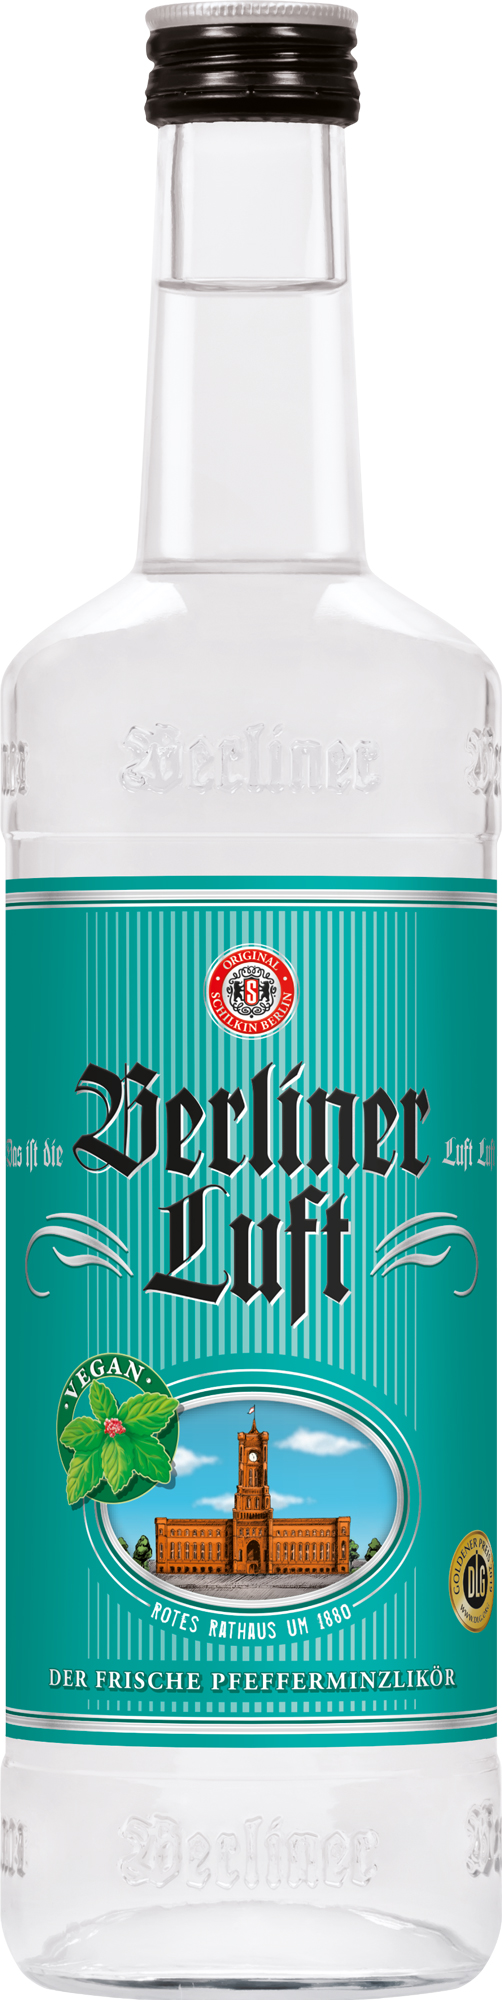 Berliner Luft Pfefferminz